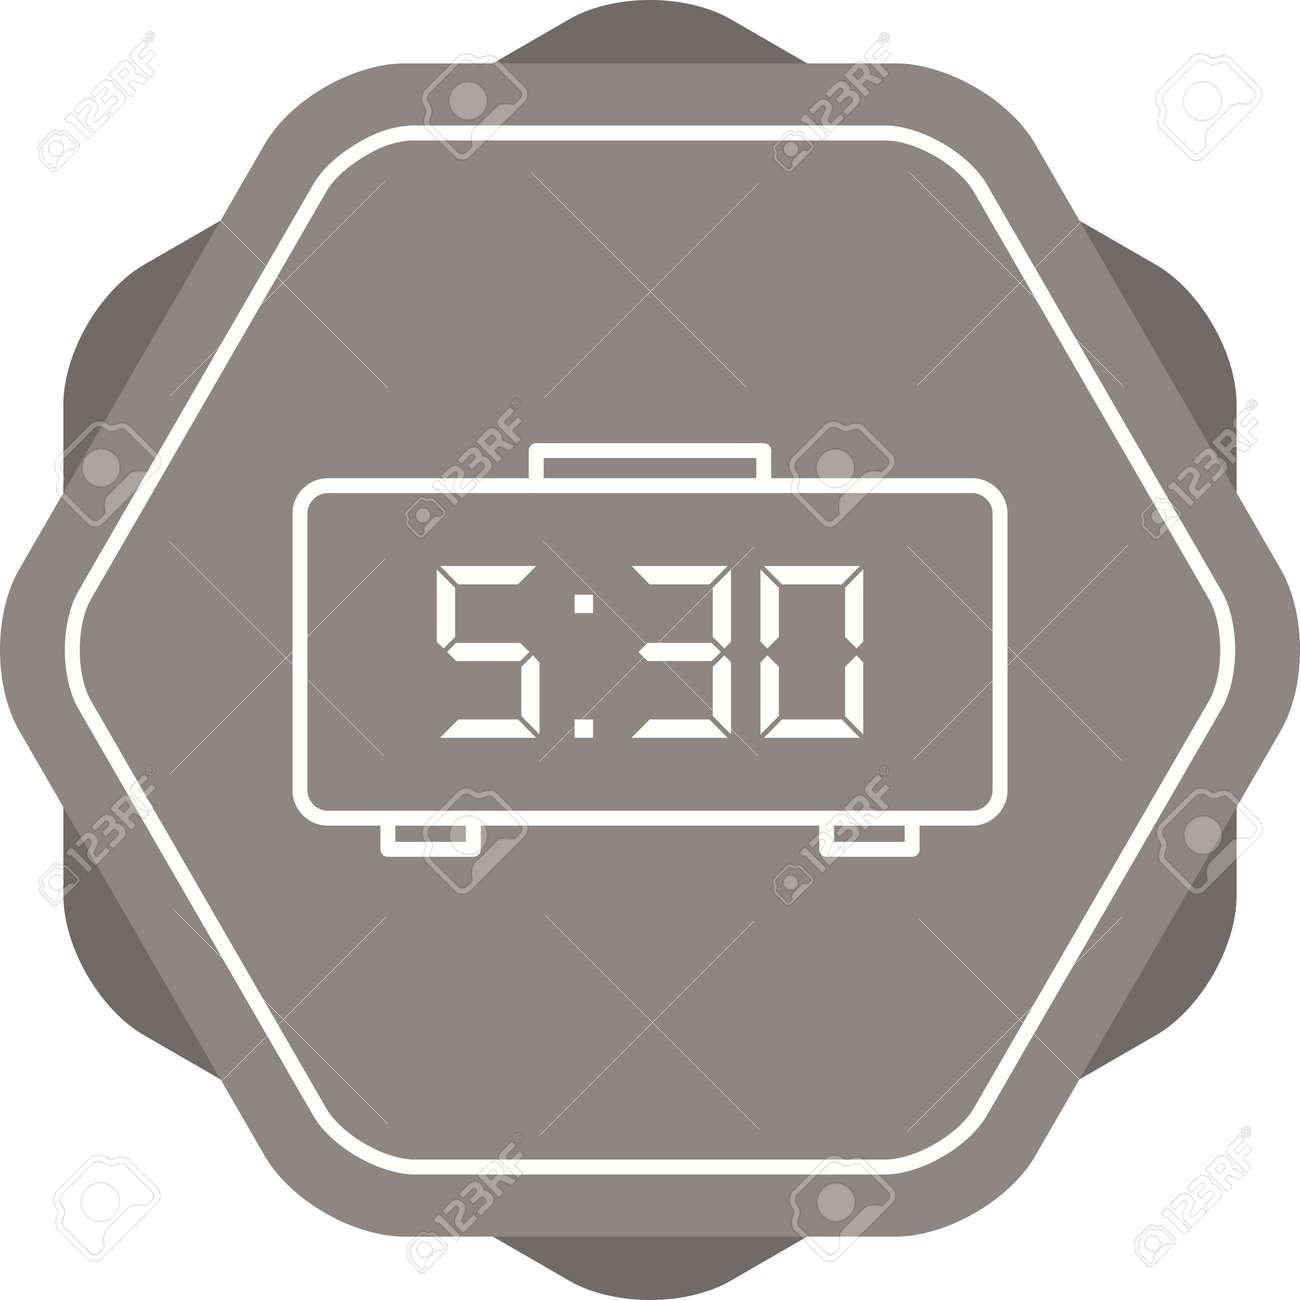 Unique Digital Clock Line Vector Icon Royalty Free Cliparts Vectors And Stock Illustration Image 138364241